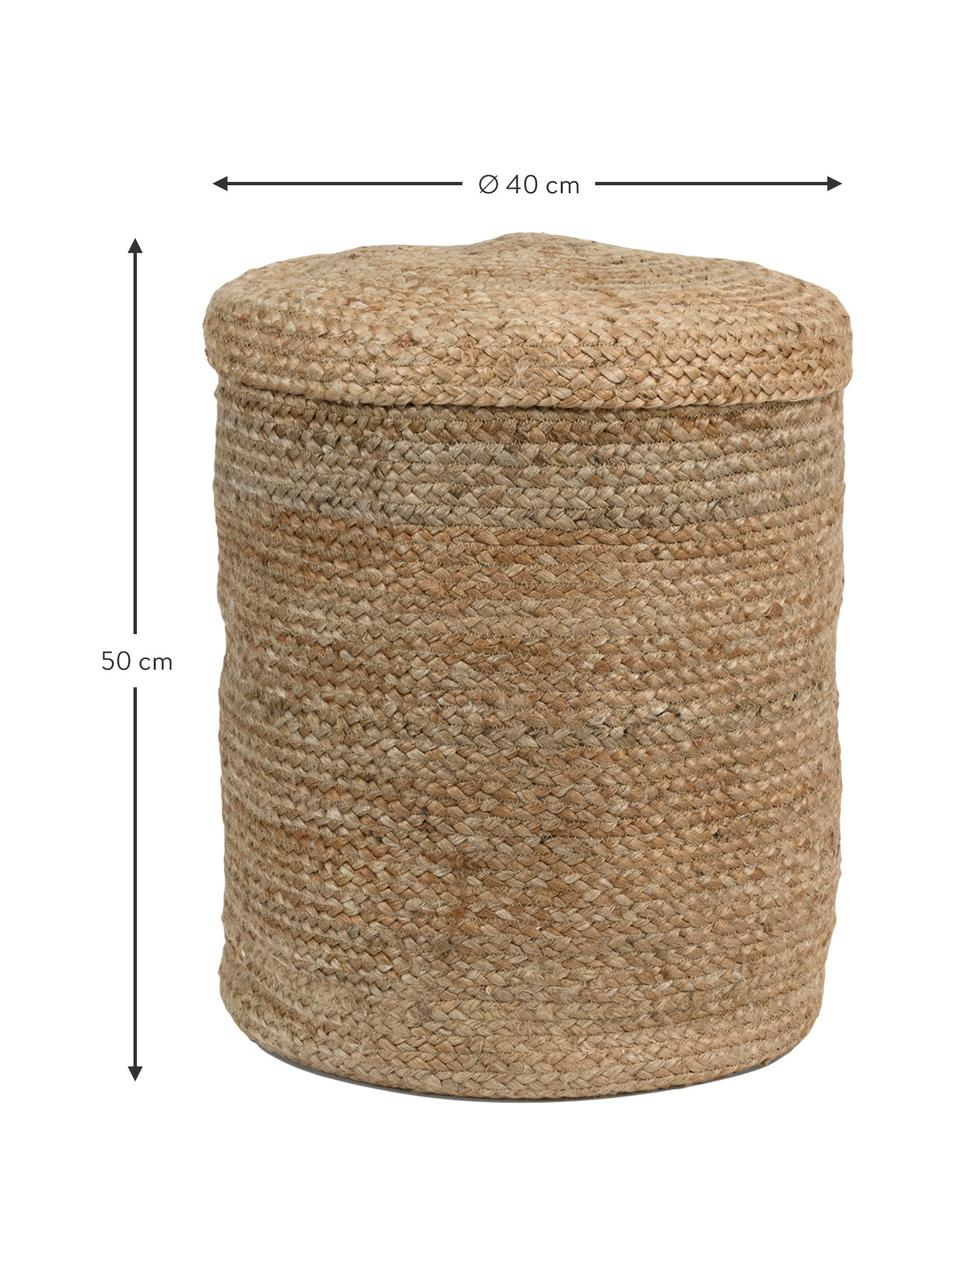 Aufbewahrungskorb Julita, 100% Jute, Jute, Ø 40 x H 50 cm